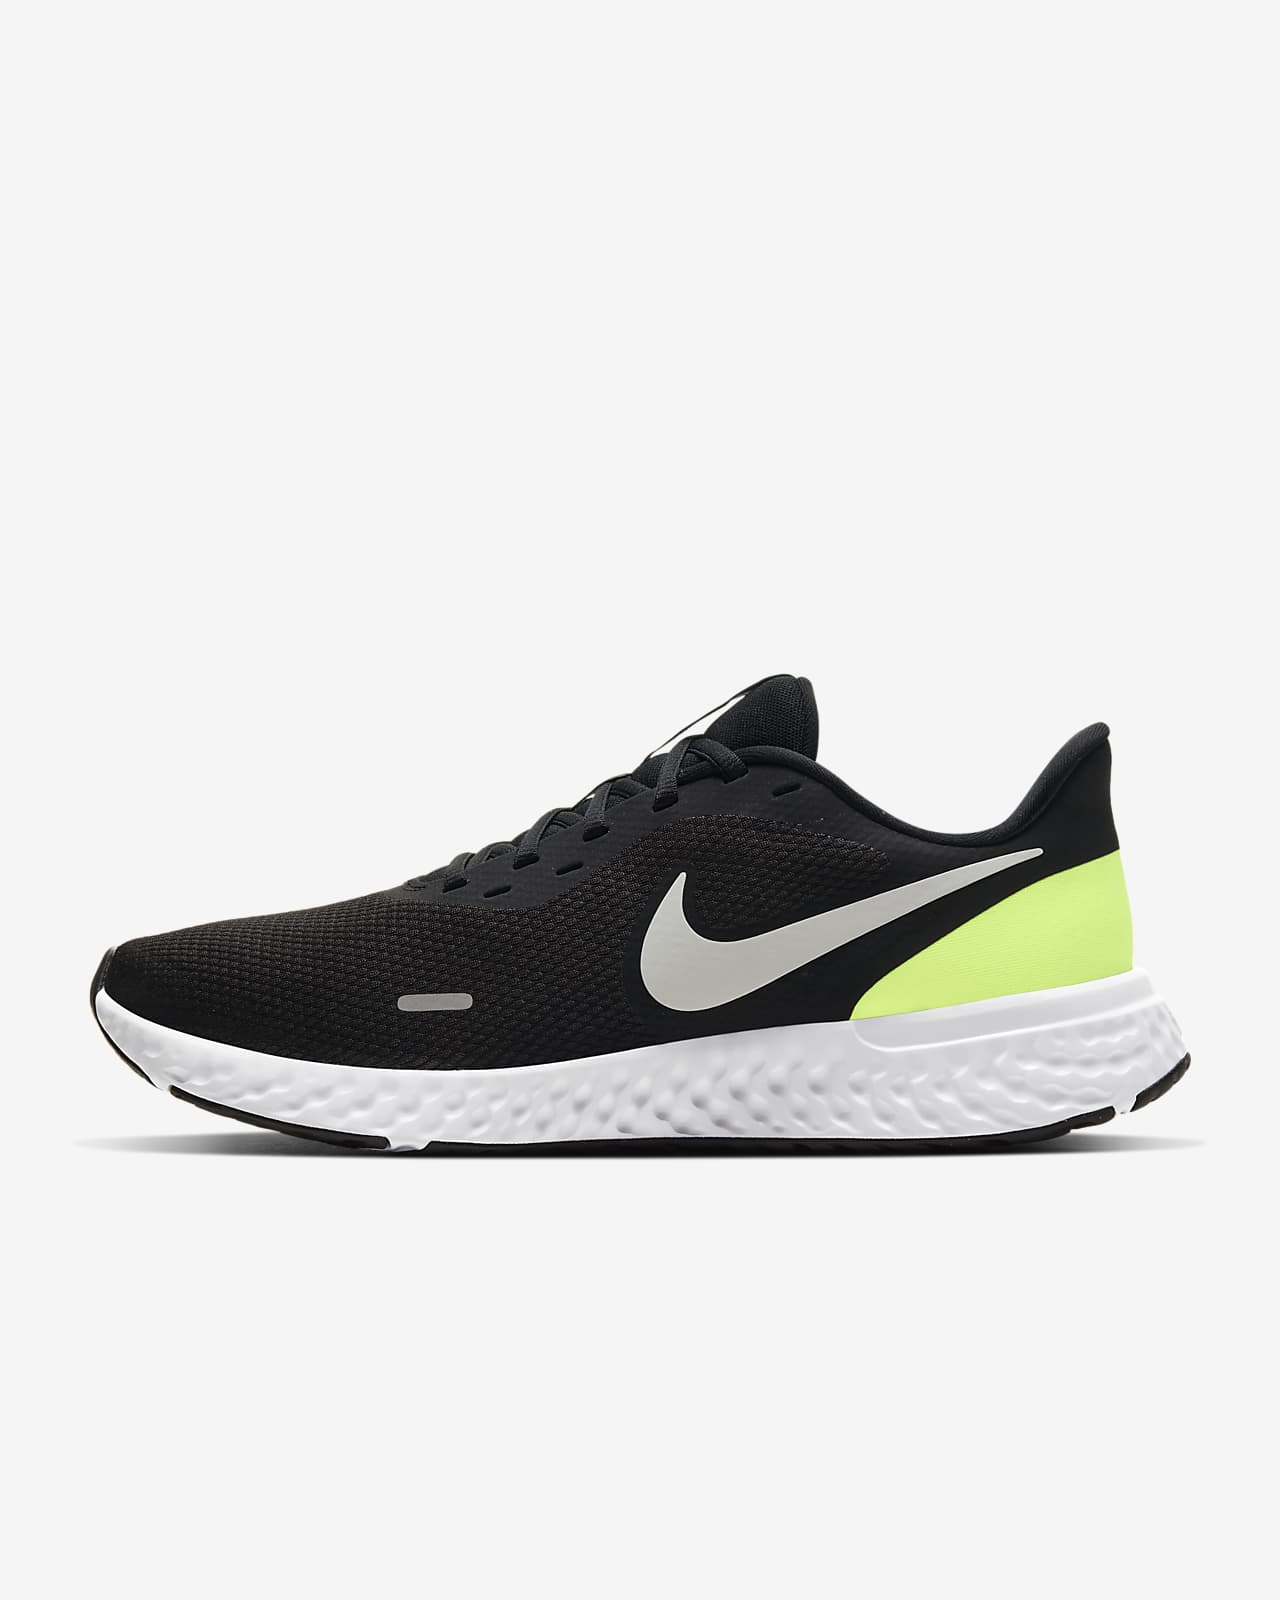 Prever donde quiera harto  Nike Revolution 5 Men's Running Shoe. Nike.com